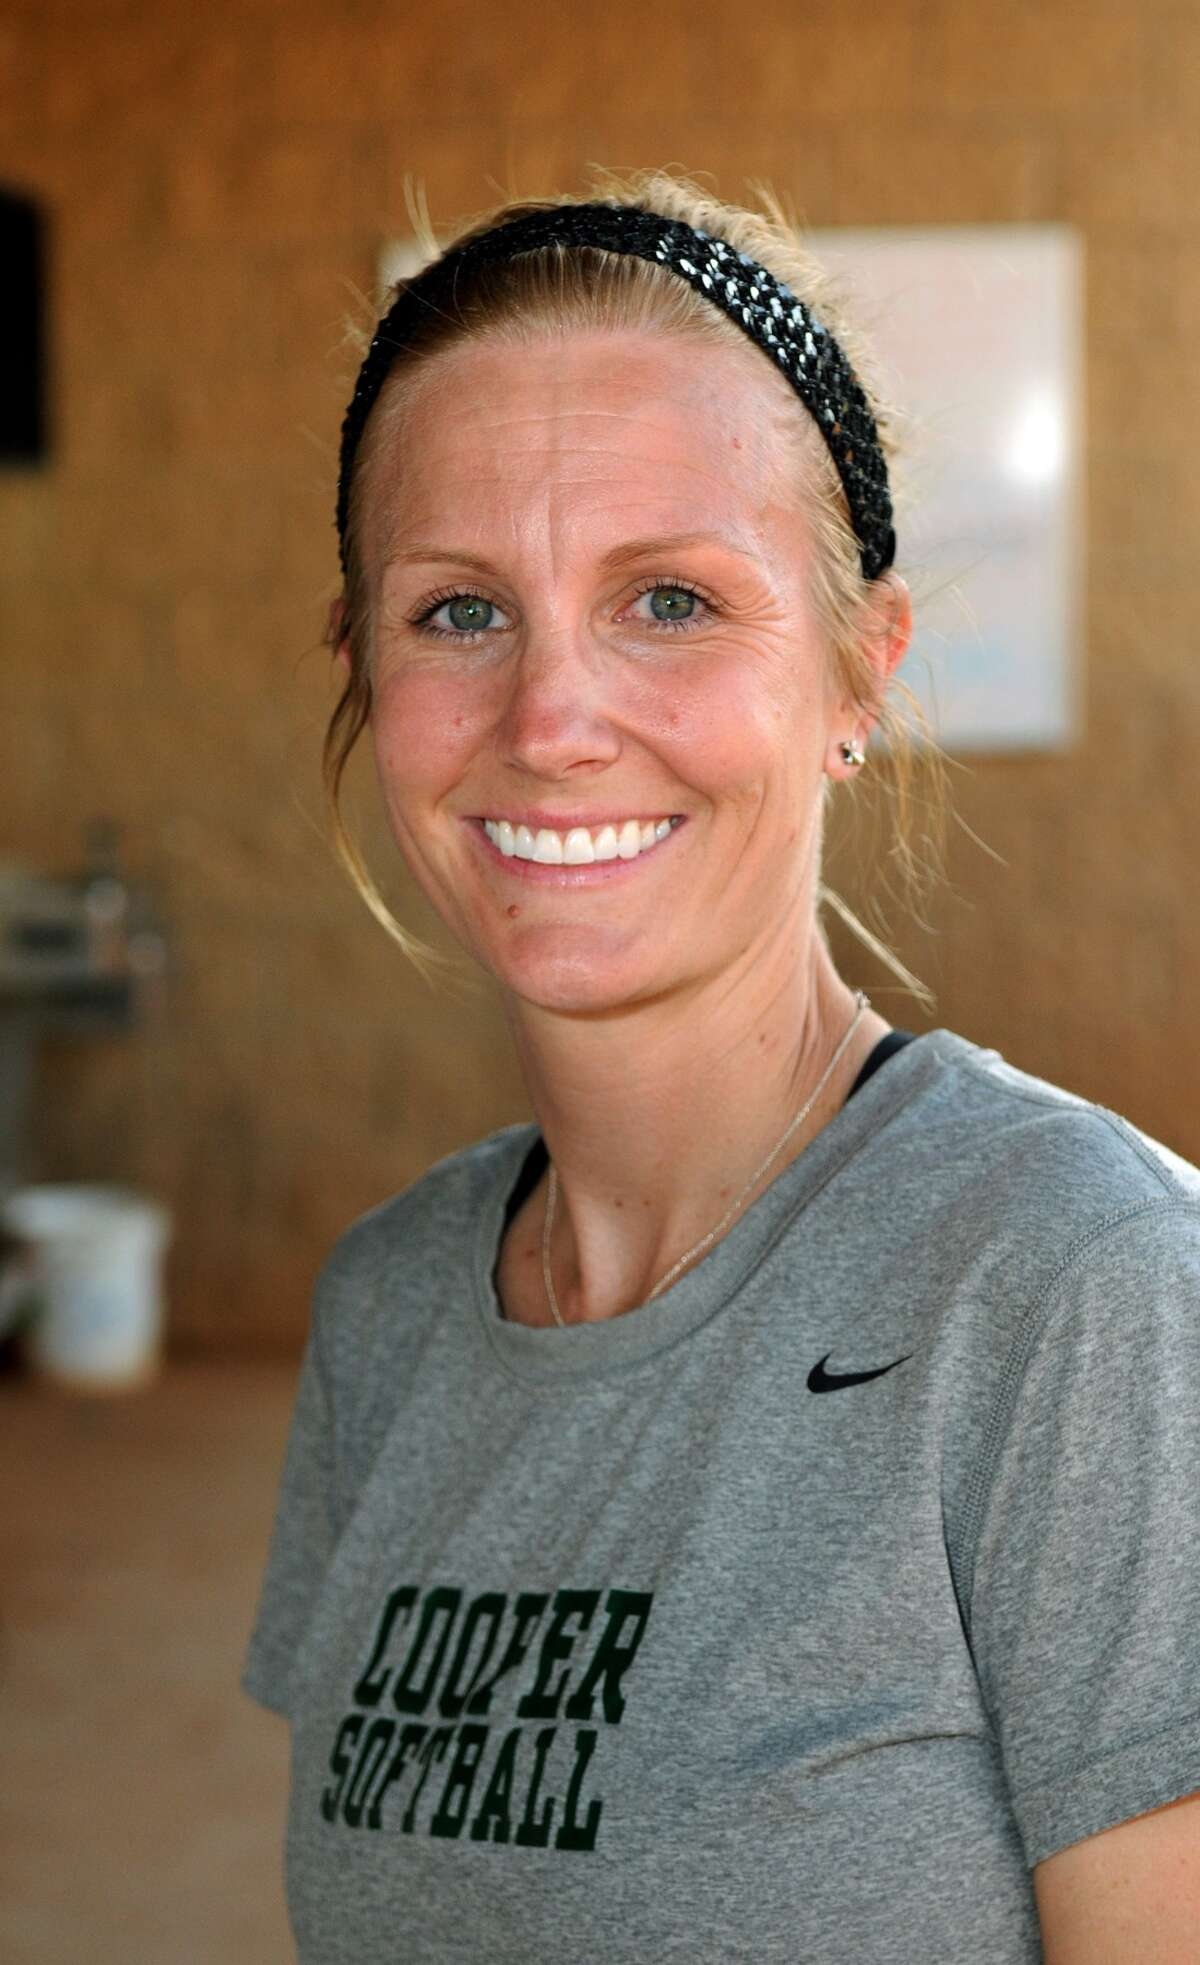 The John Cooper School head softball coach Nicole Hedden